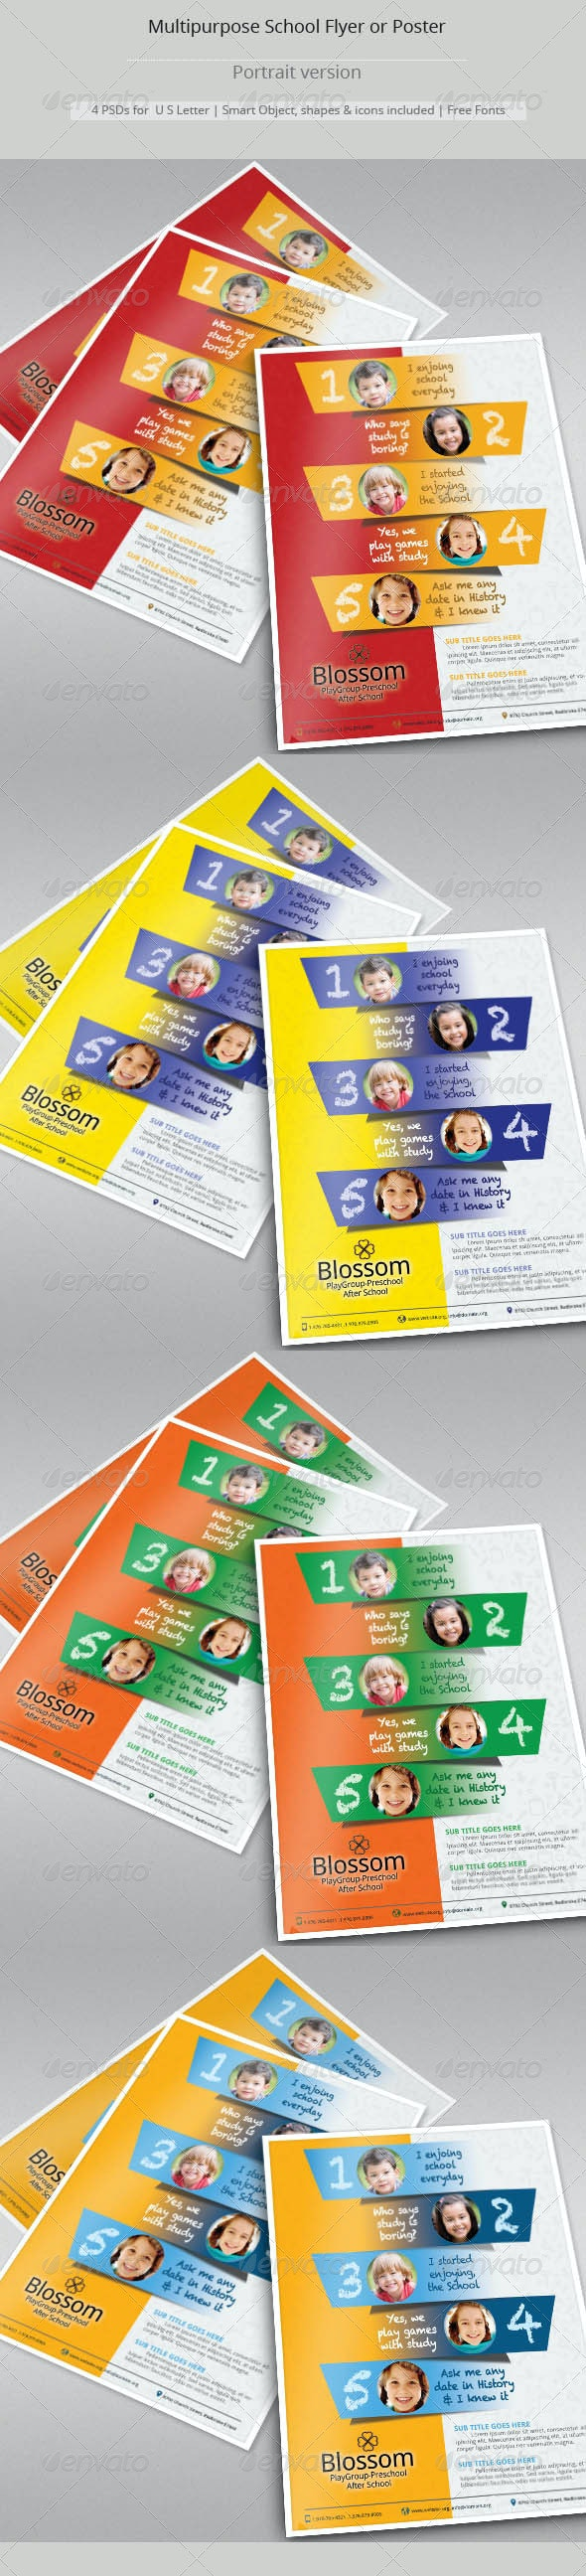 Multipurpose School Flyer Templates - Corporate Flyers